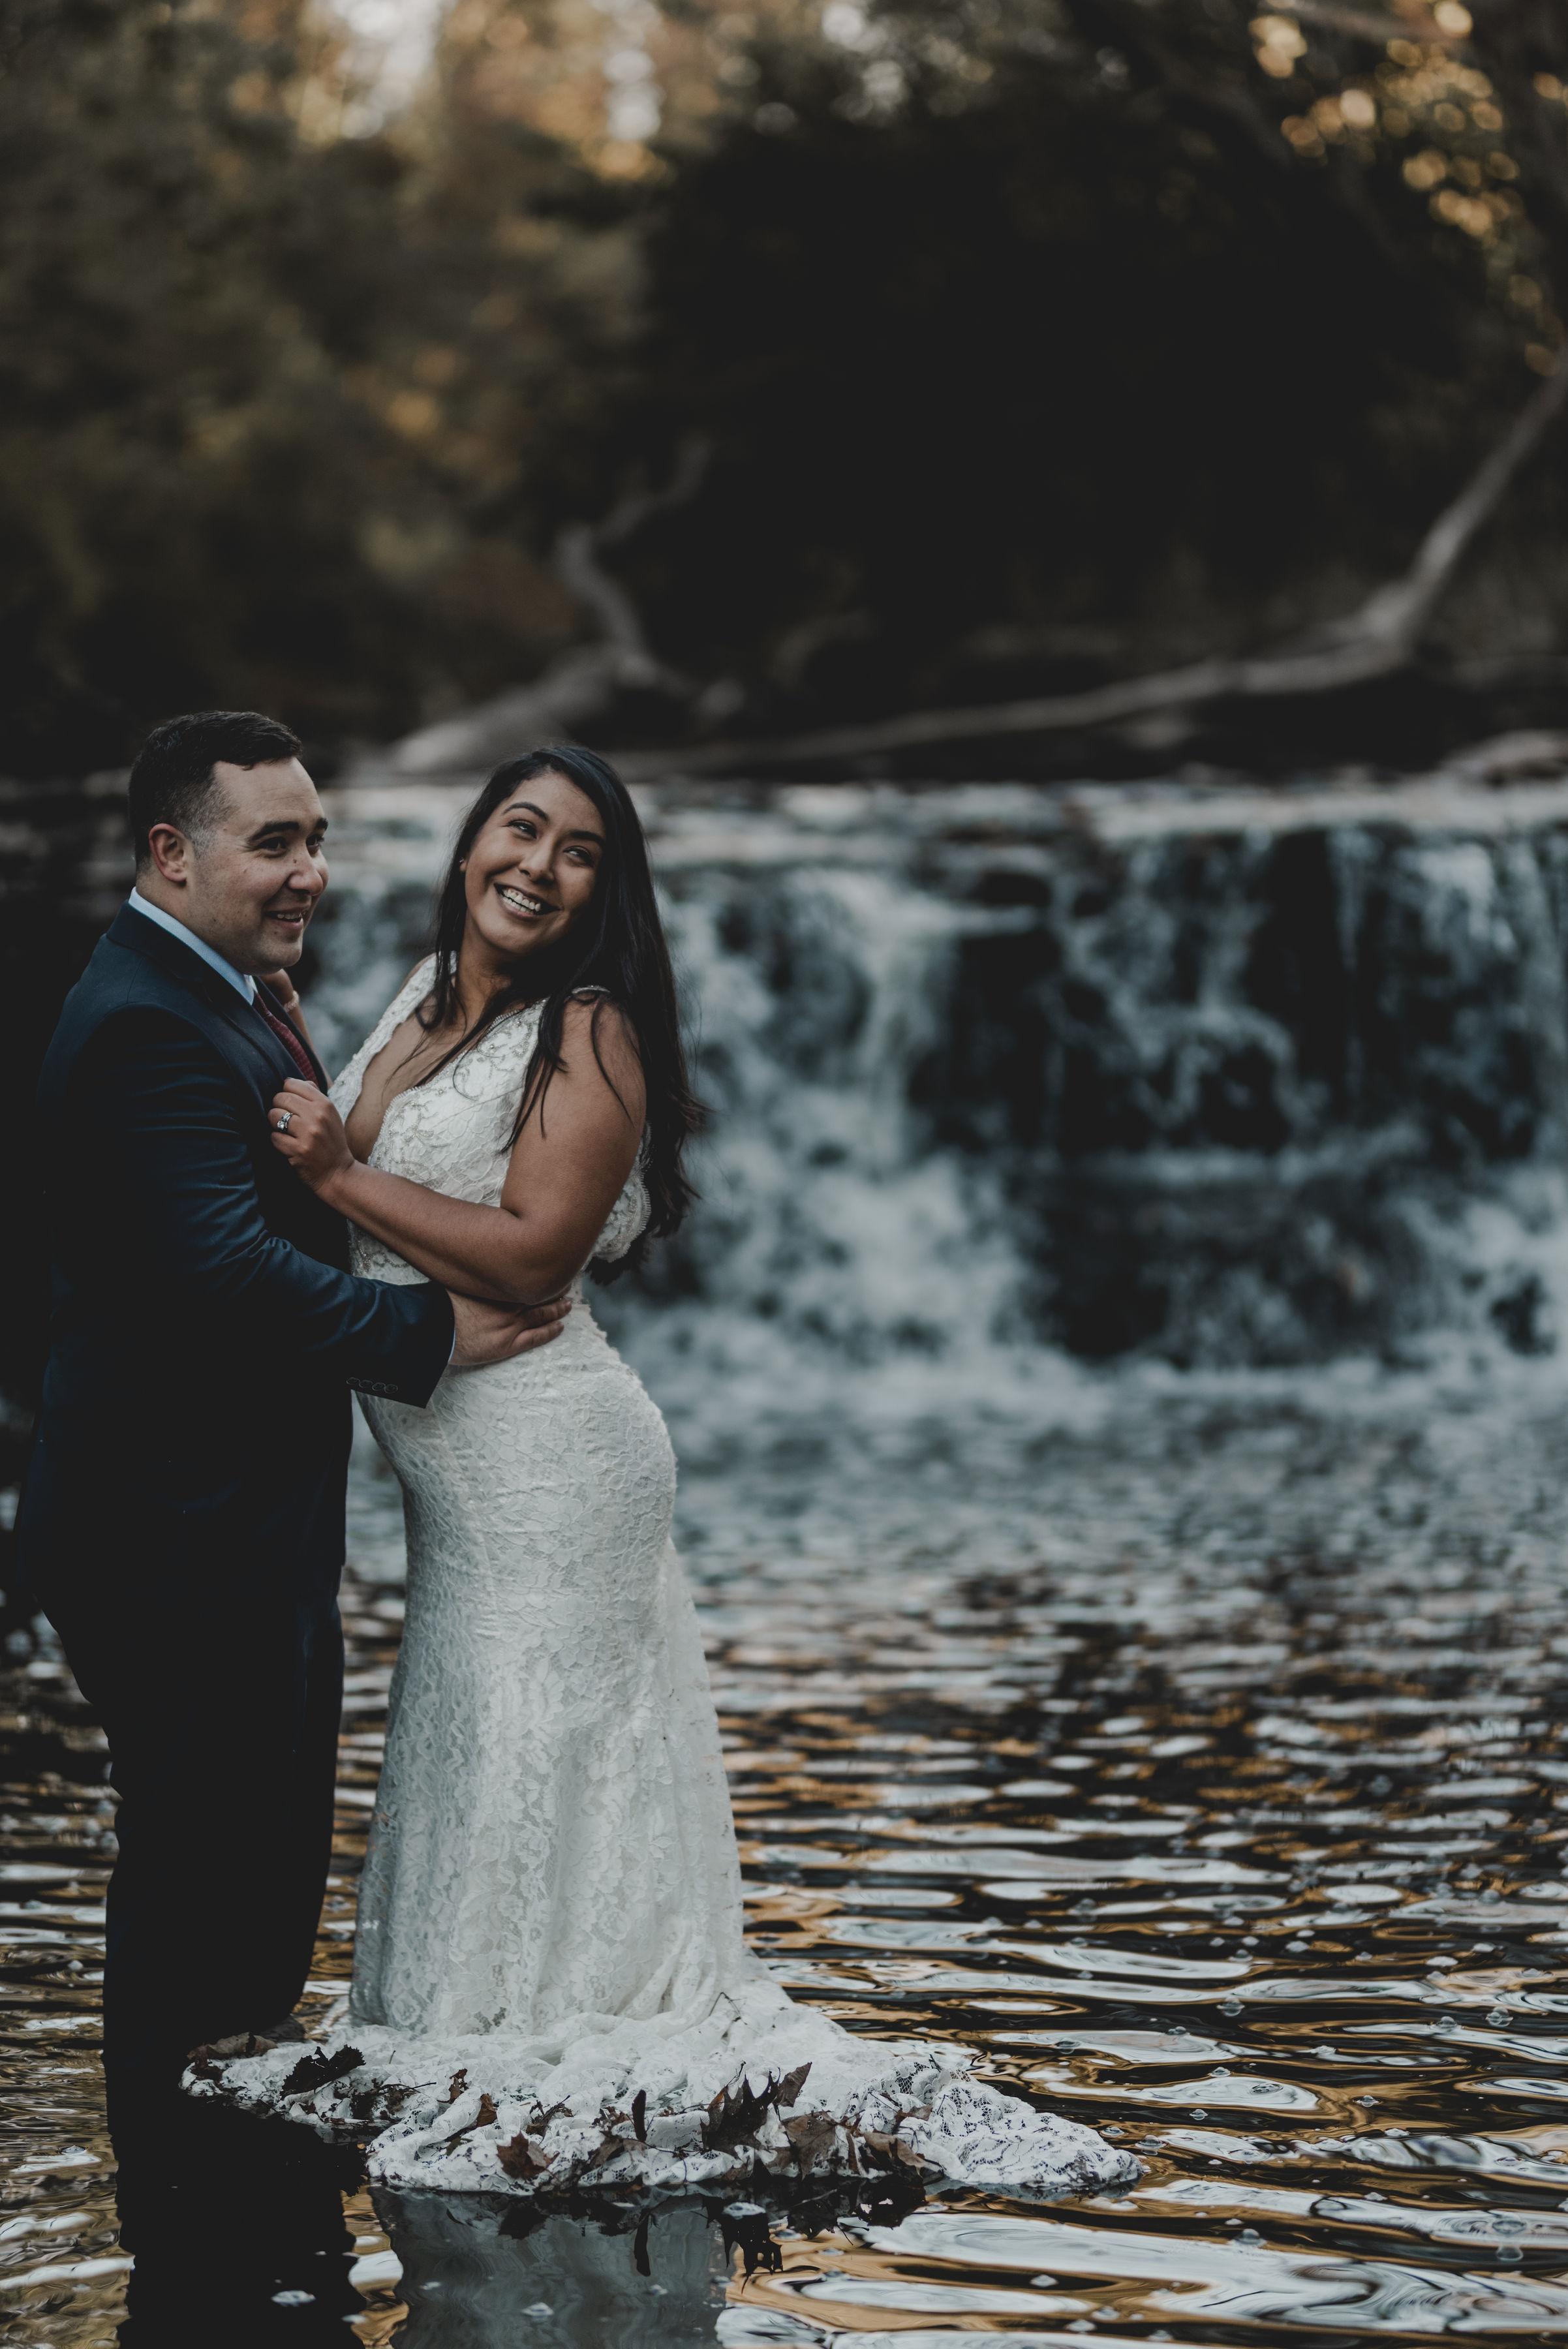 Bride and Groom Portrait Waterfall Glen Chicago Elopement Jenn Marie Photography